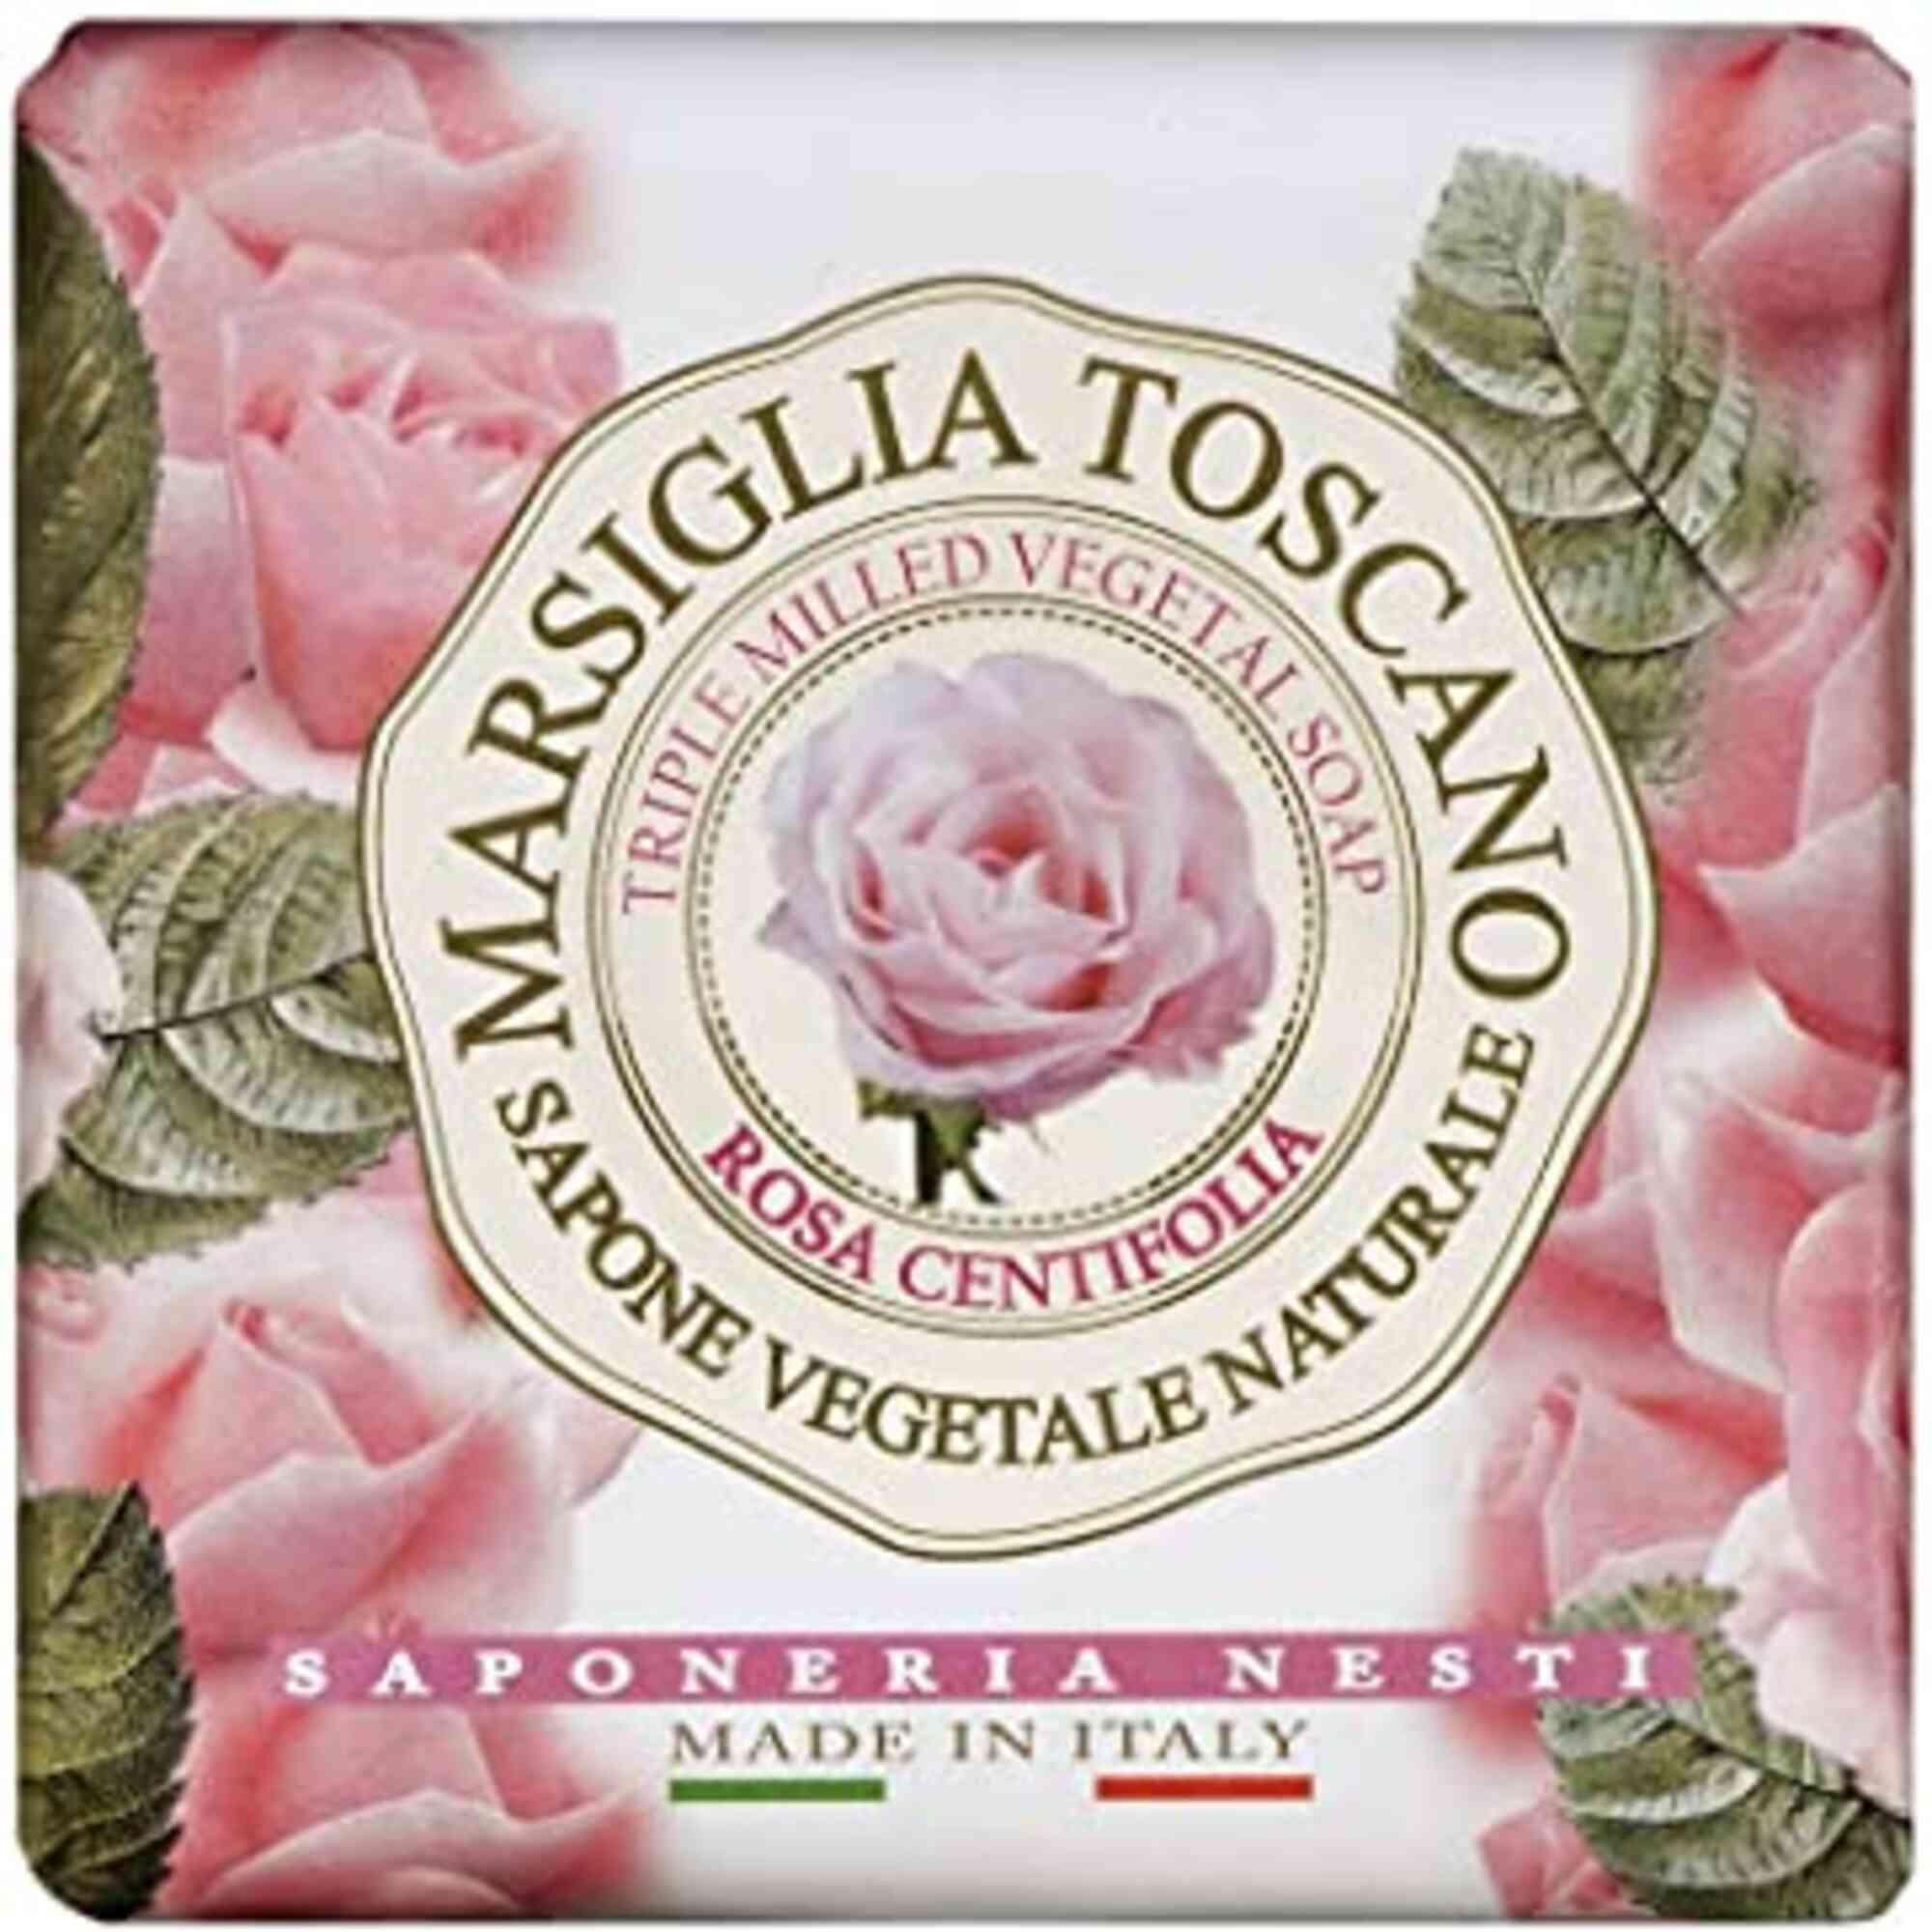 Sabonete Barra Marsiglia Toscano Rosa Centifolia 200gr Nesti Dante